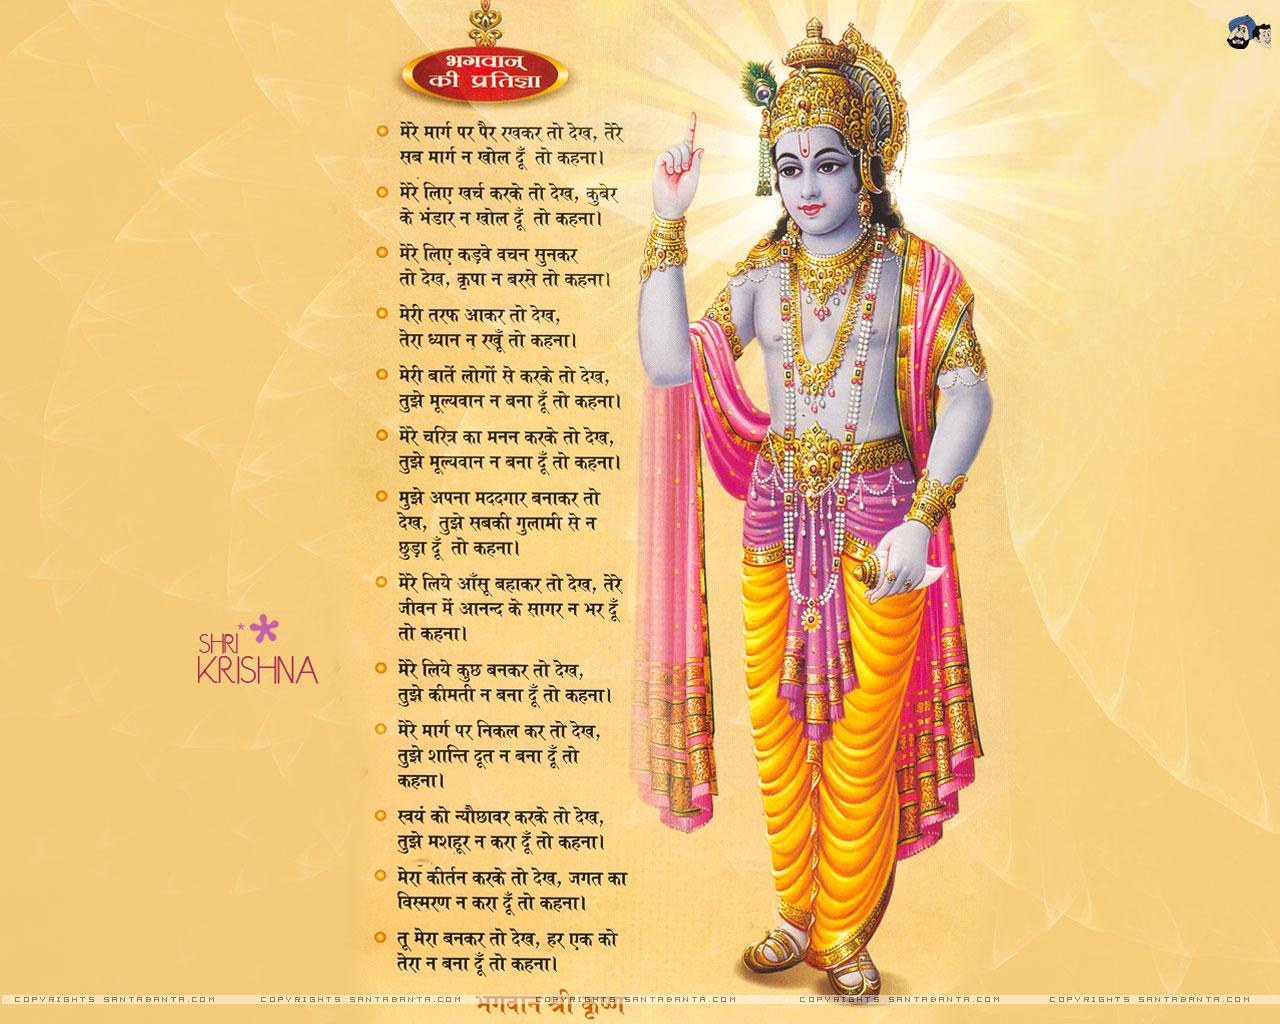 http://1.bp.blogspot.com/_2QHcx0puPFg/Swe4AQh6qTI/AAAAAAAAF2A/XA8Lo2oBYVY/s1600/lord-krishna11.jpg